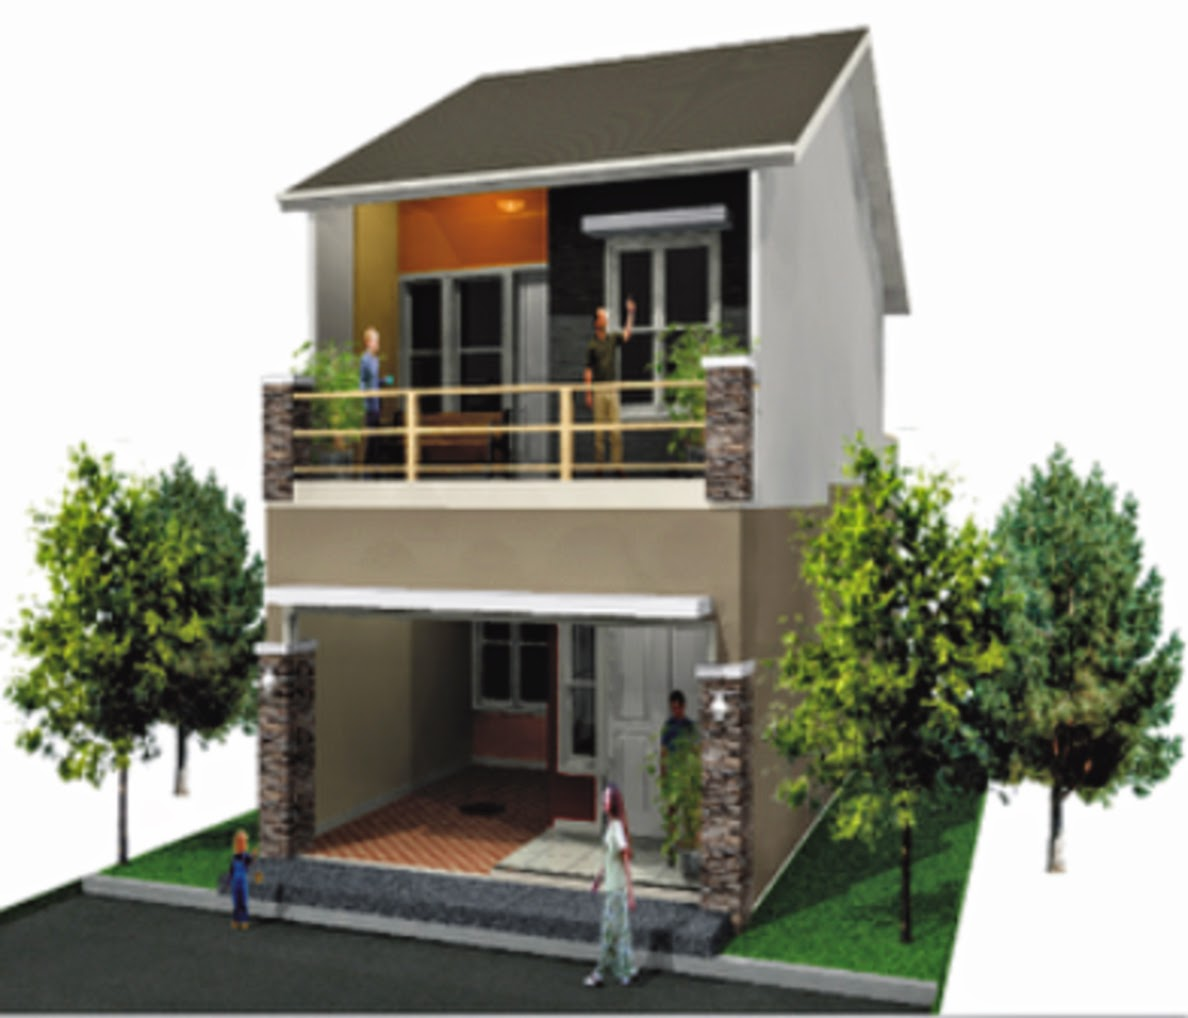 100 Gambar Rumah Minimalis 2 Lantai Sangat Sederhana